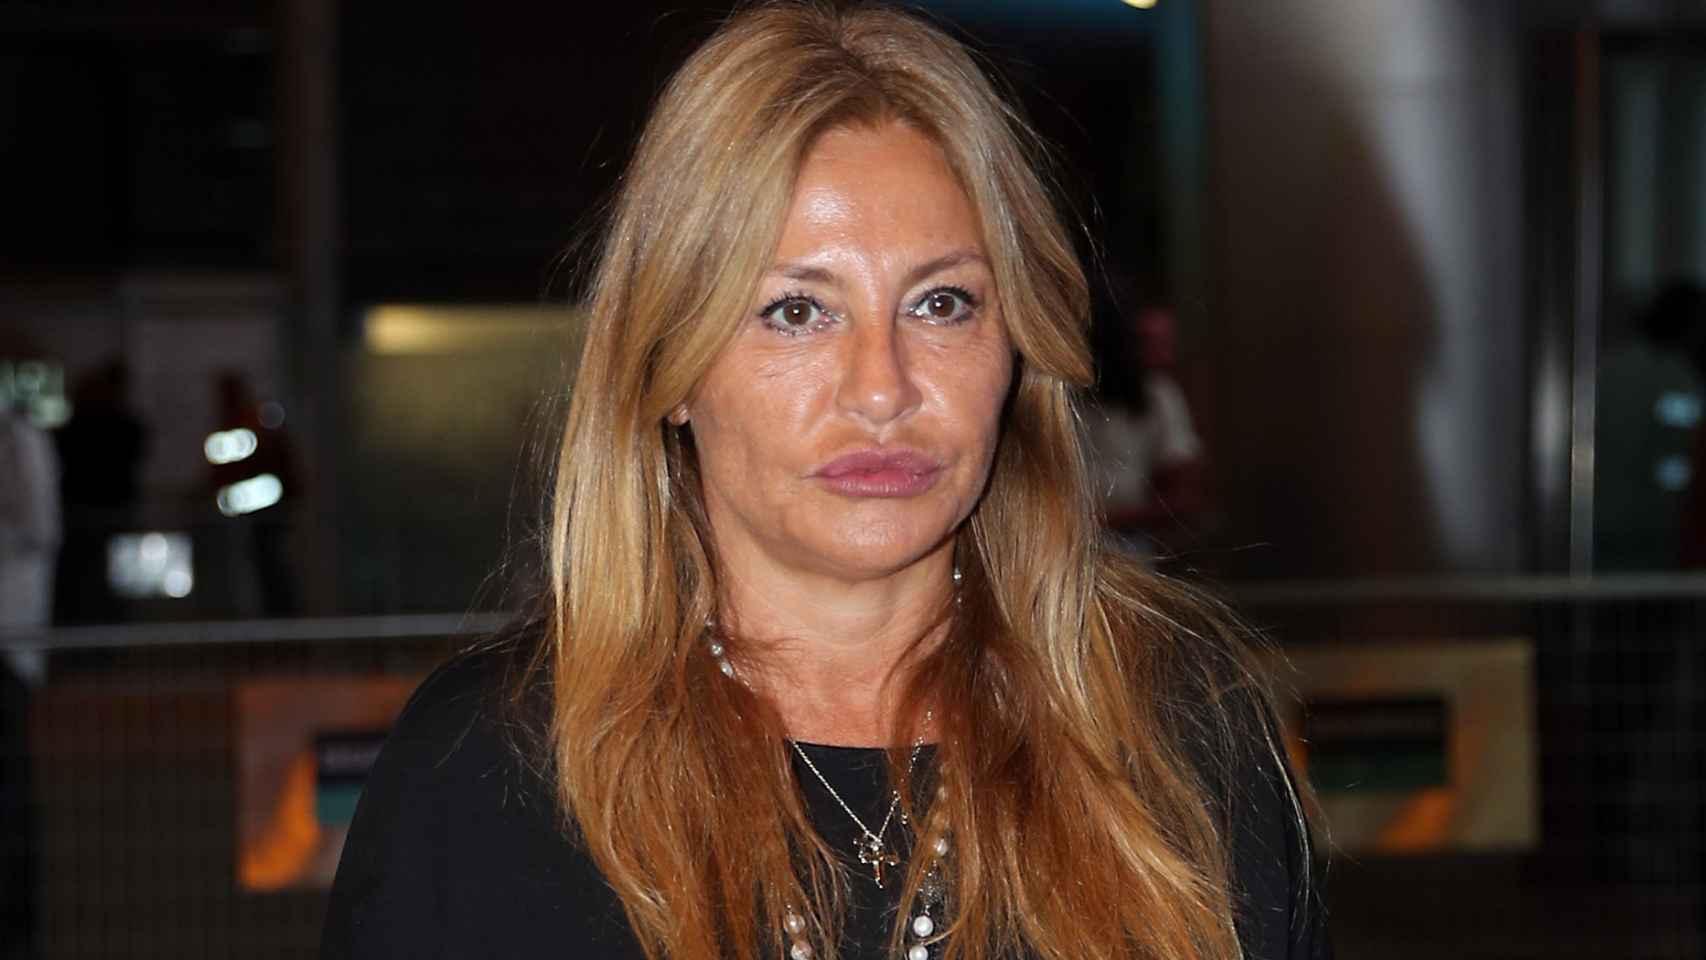 Cristina Tárrega en imagen de archivo.